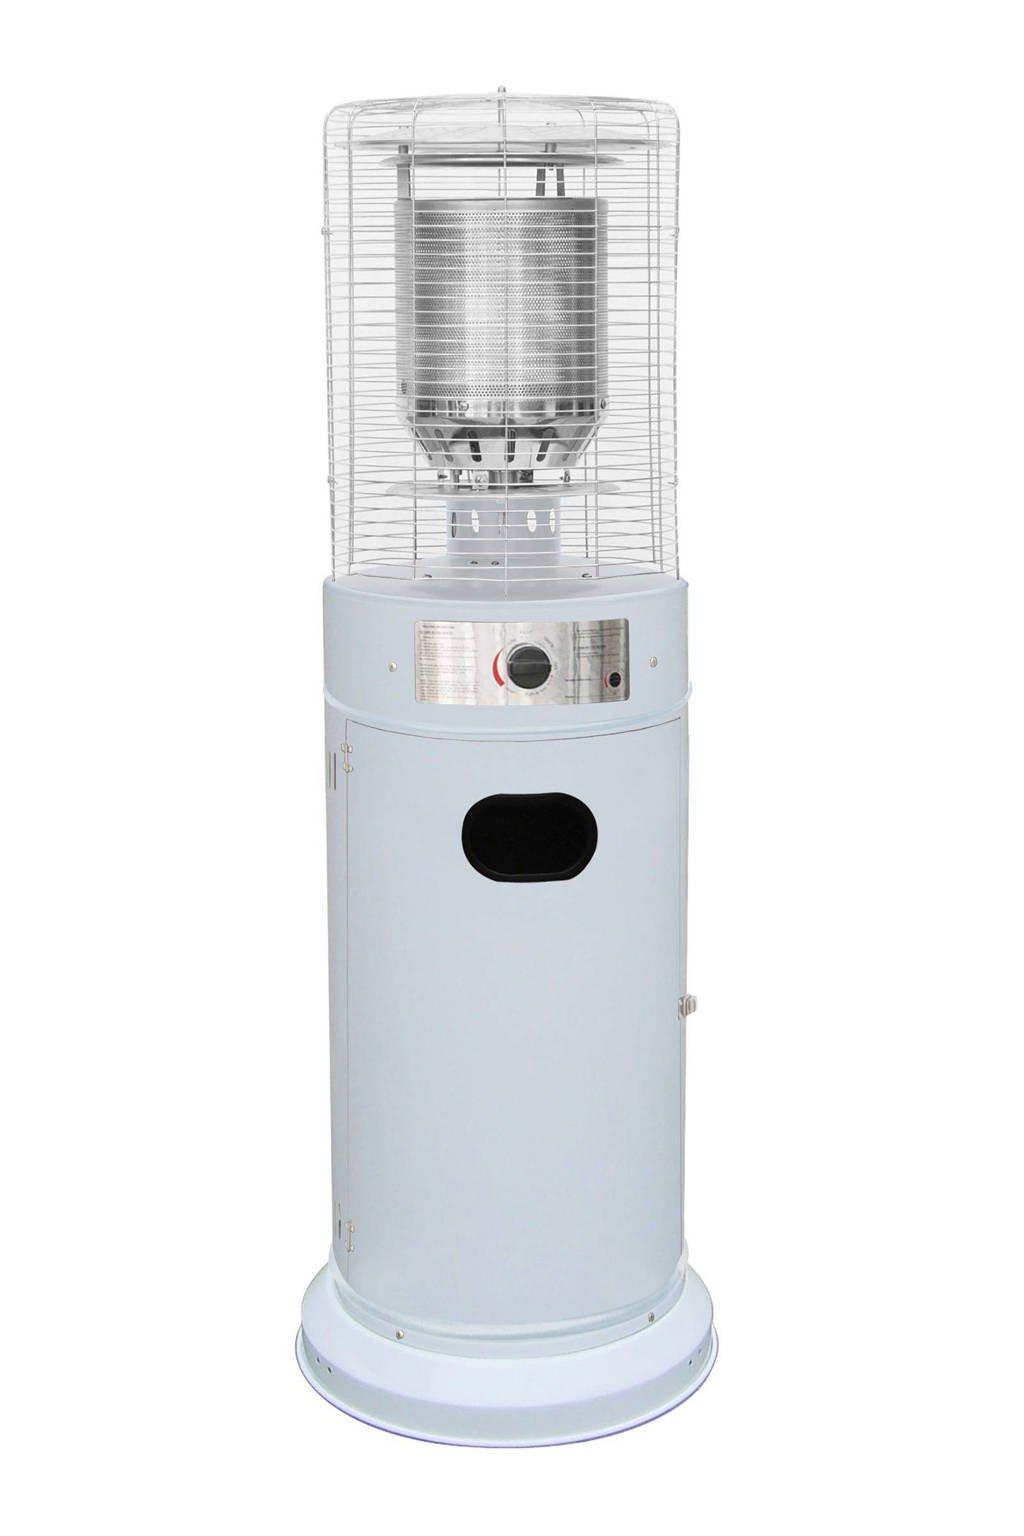 Sunred lounge heater LH15W, Wit